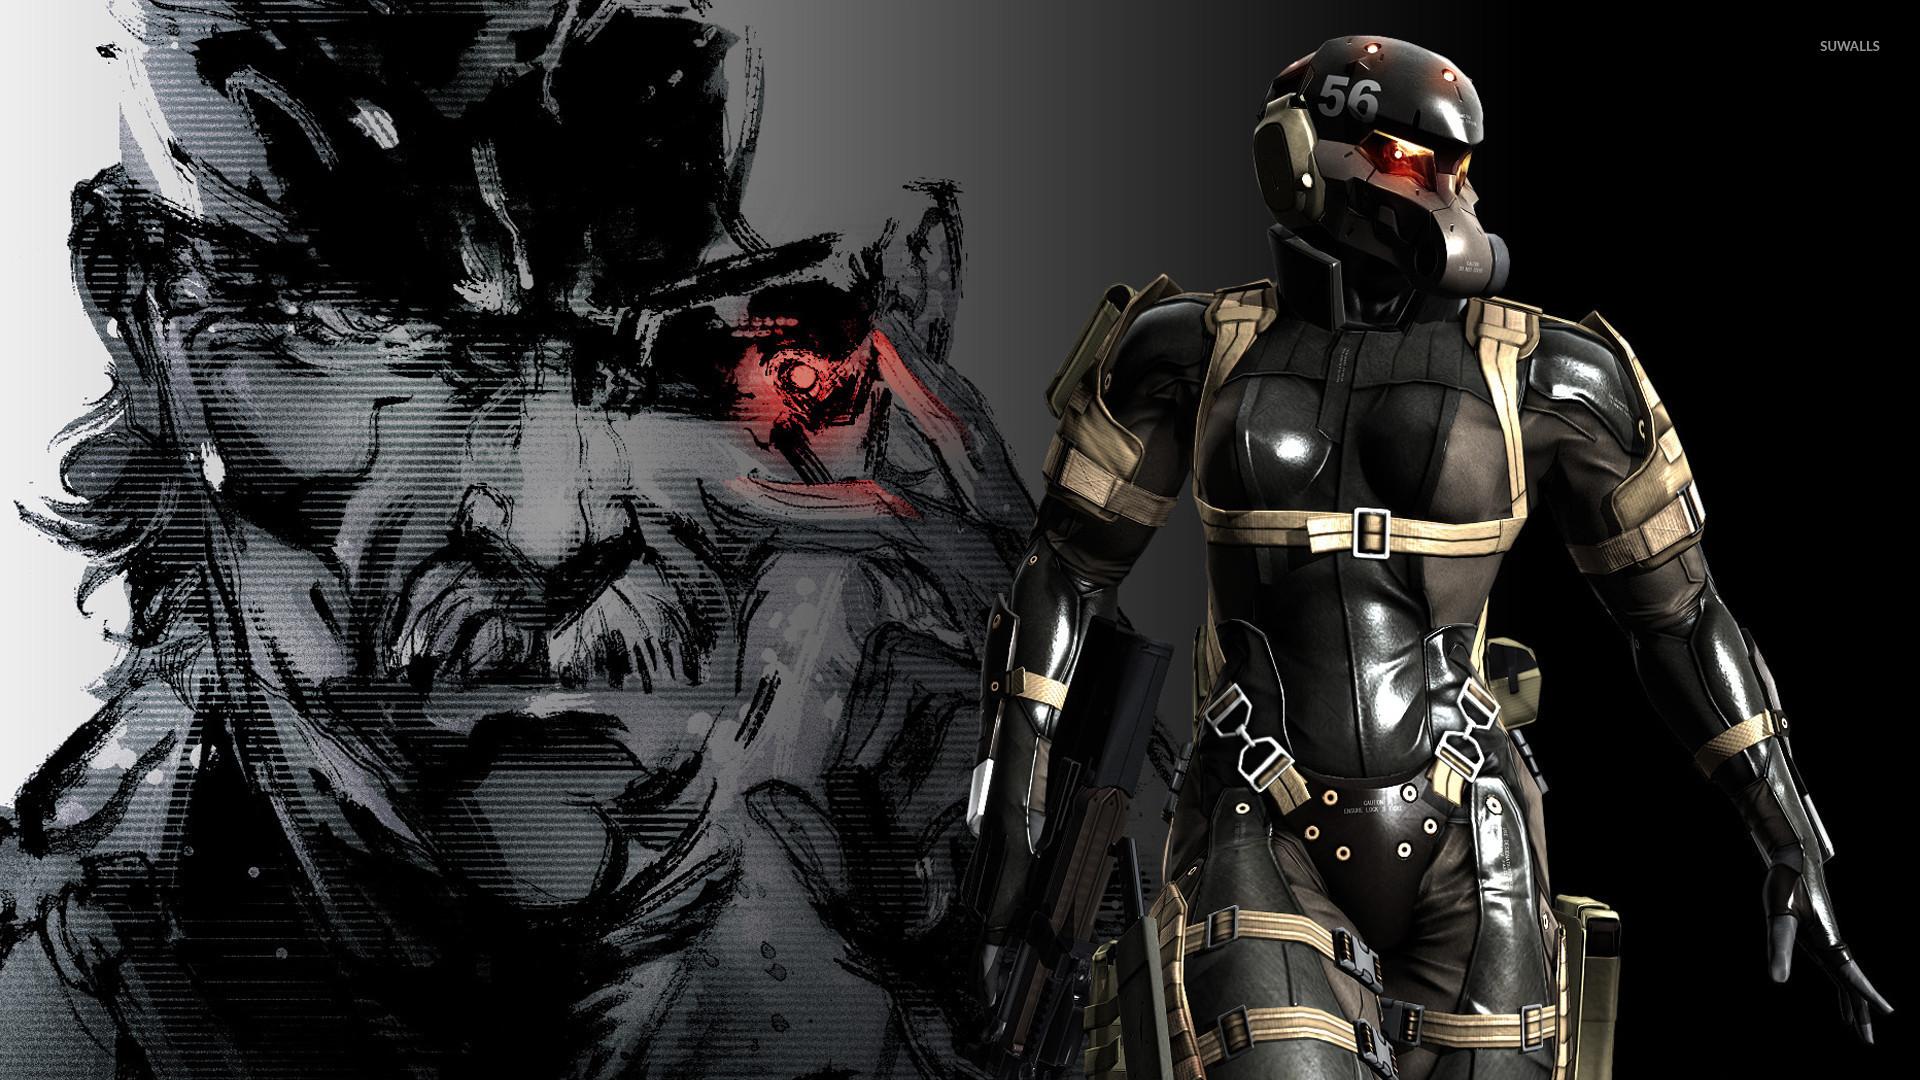 Metal Gear Solid [6] wallpaper